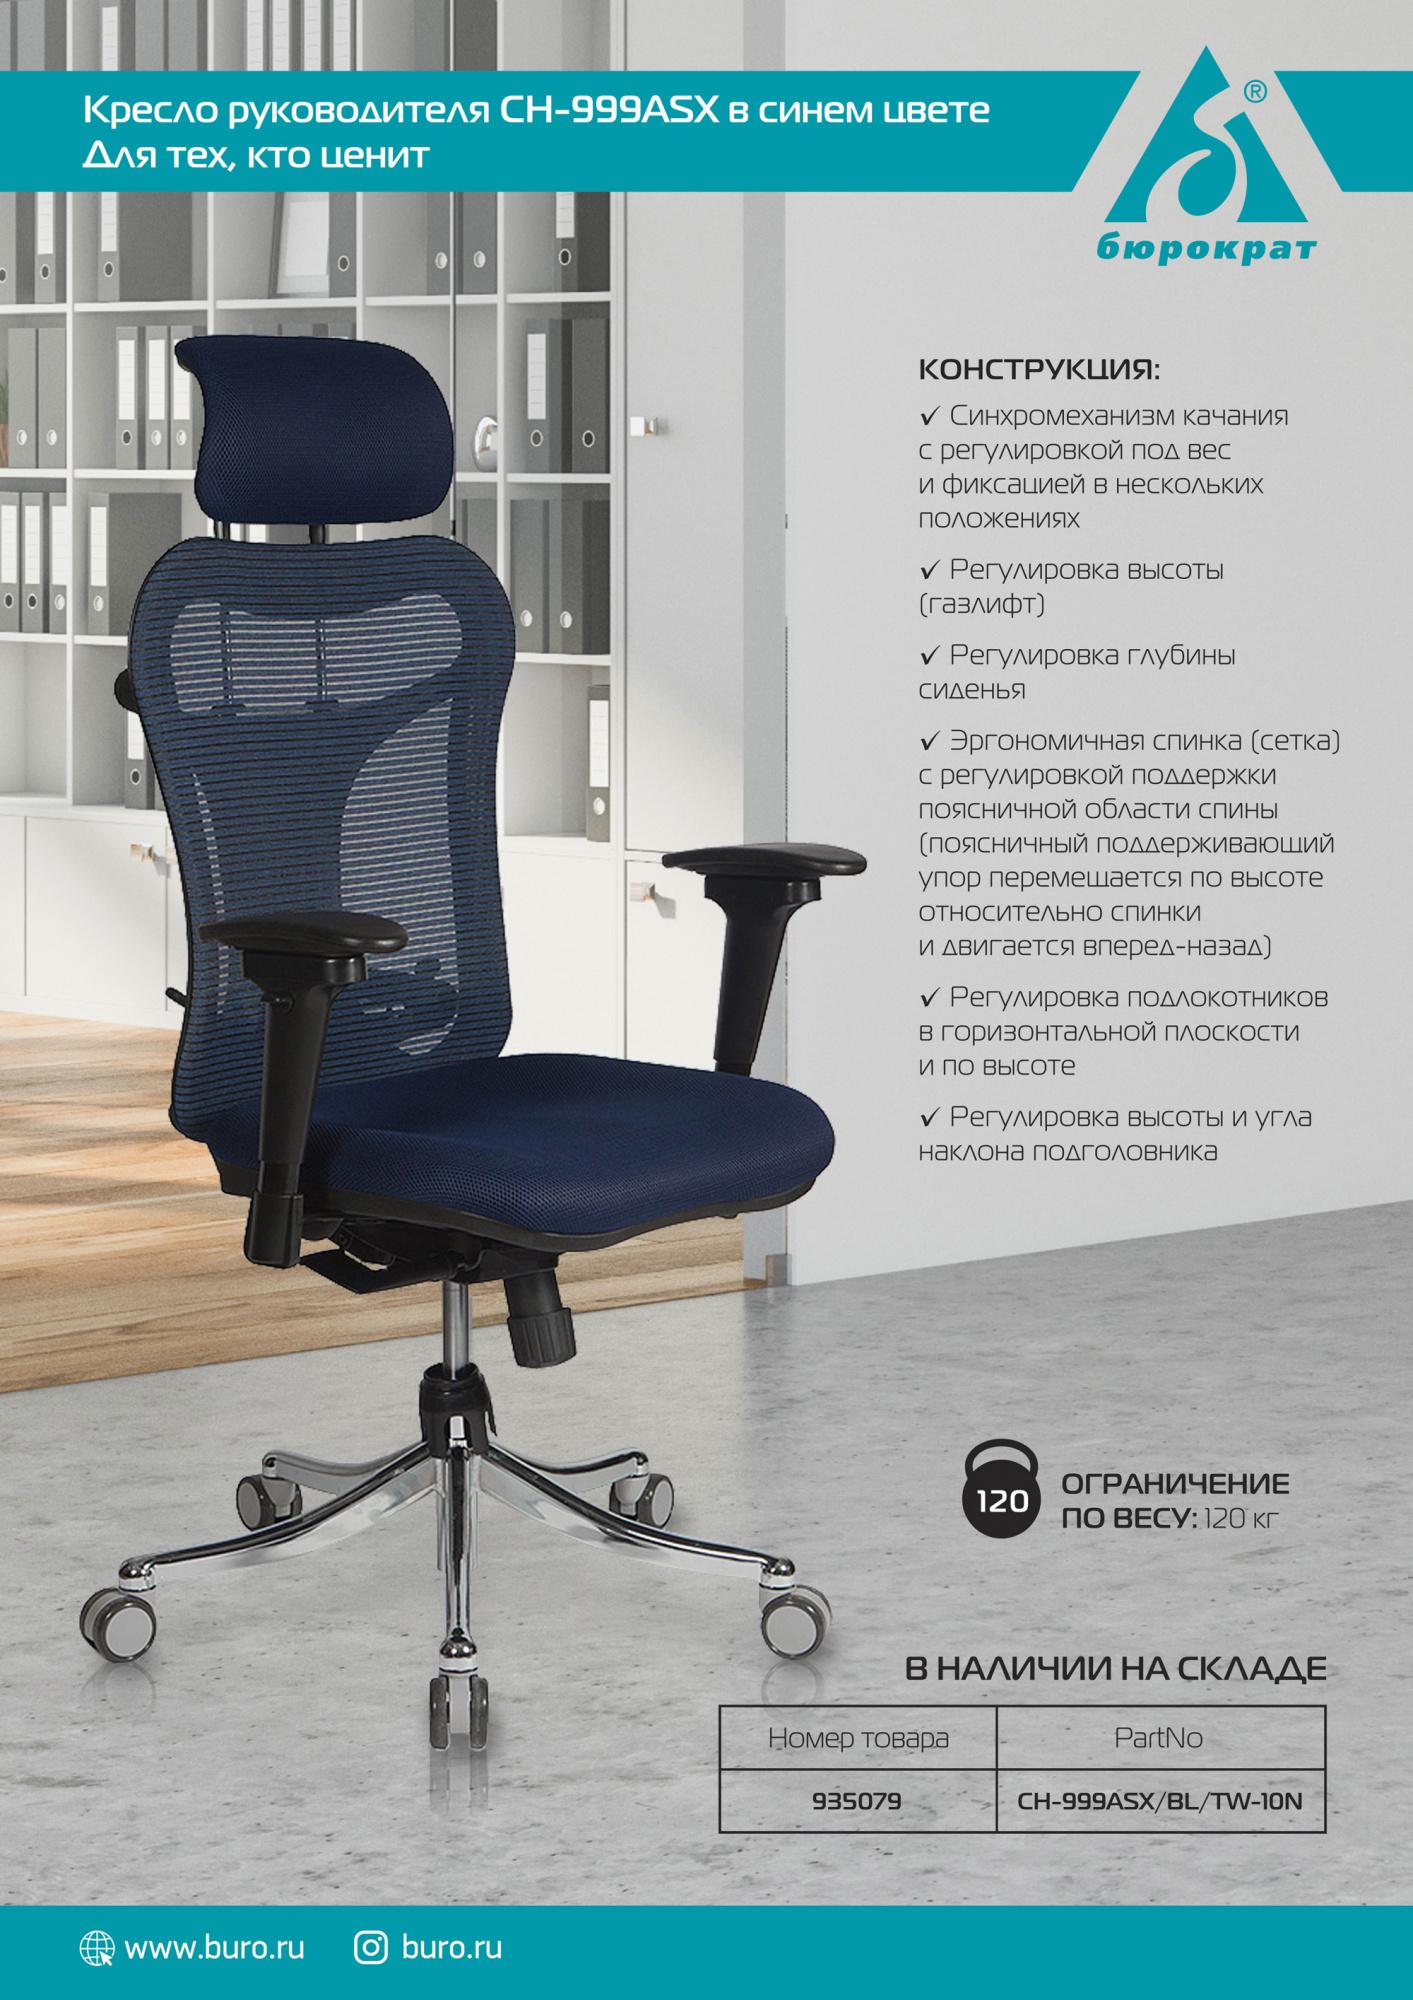 Кресло руководителя Бюрократ CH-999ASX/BL/TW-10N спинка сетка синий сиденье синий TW-10N - фотография 5